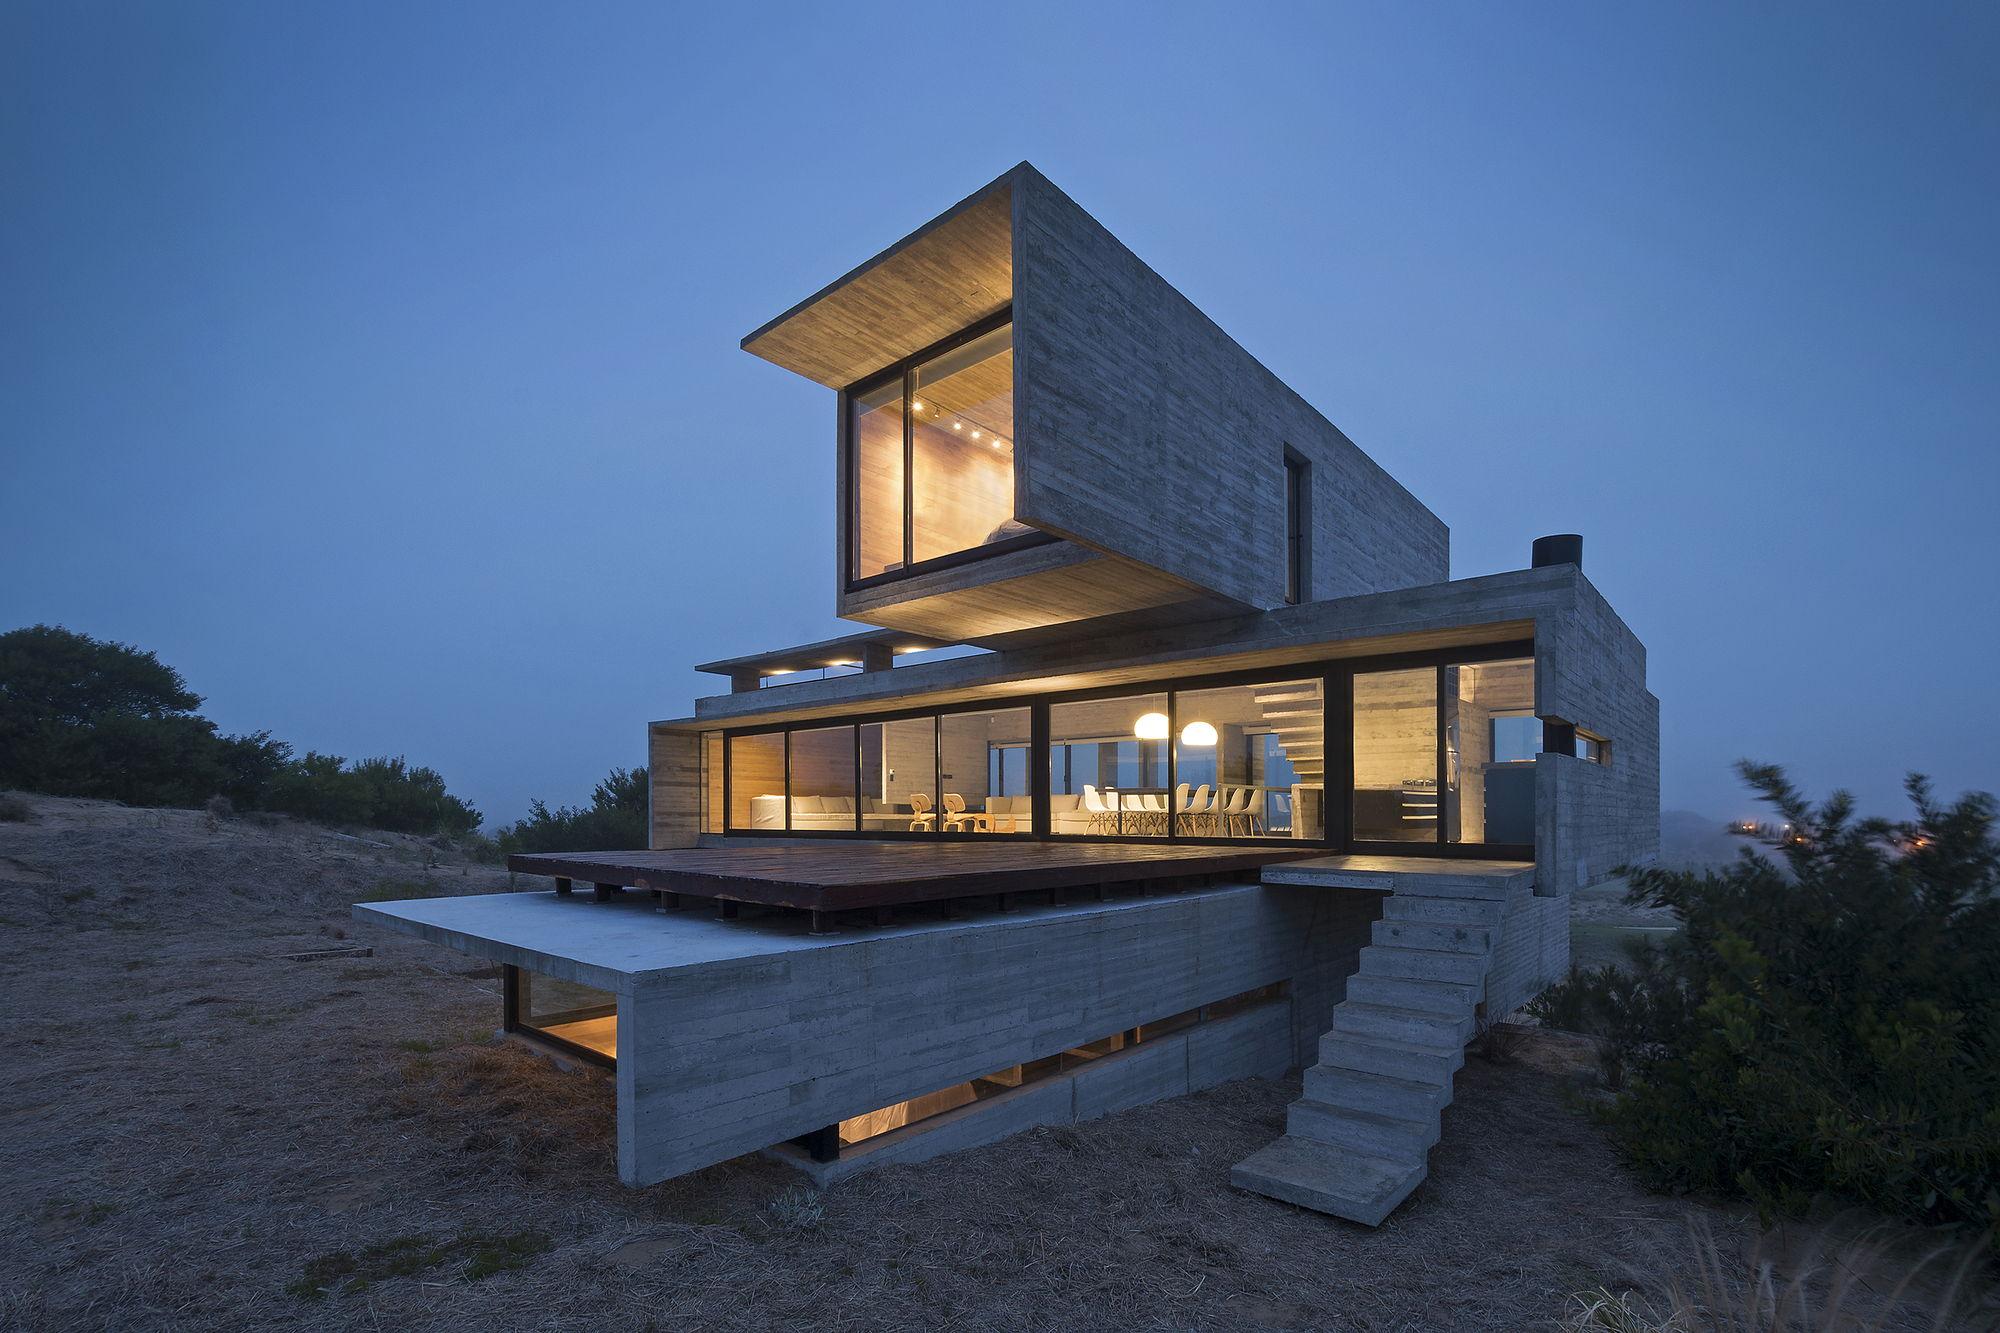 Casa Golf House: The Project Of Luciano Kruk Arquitectos